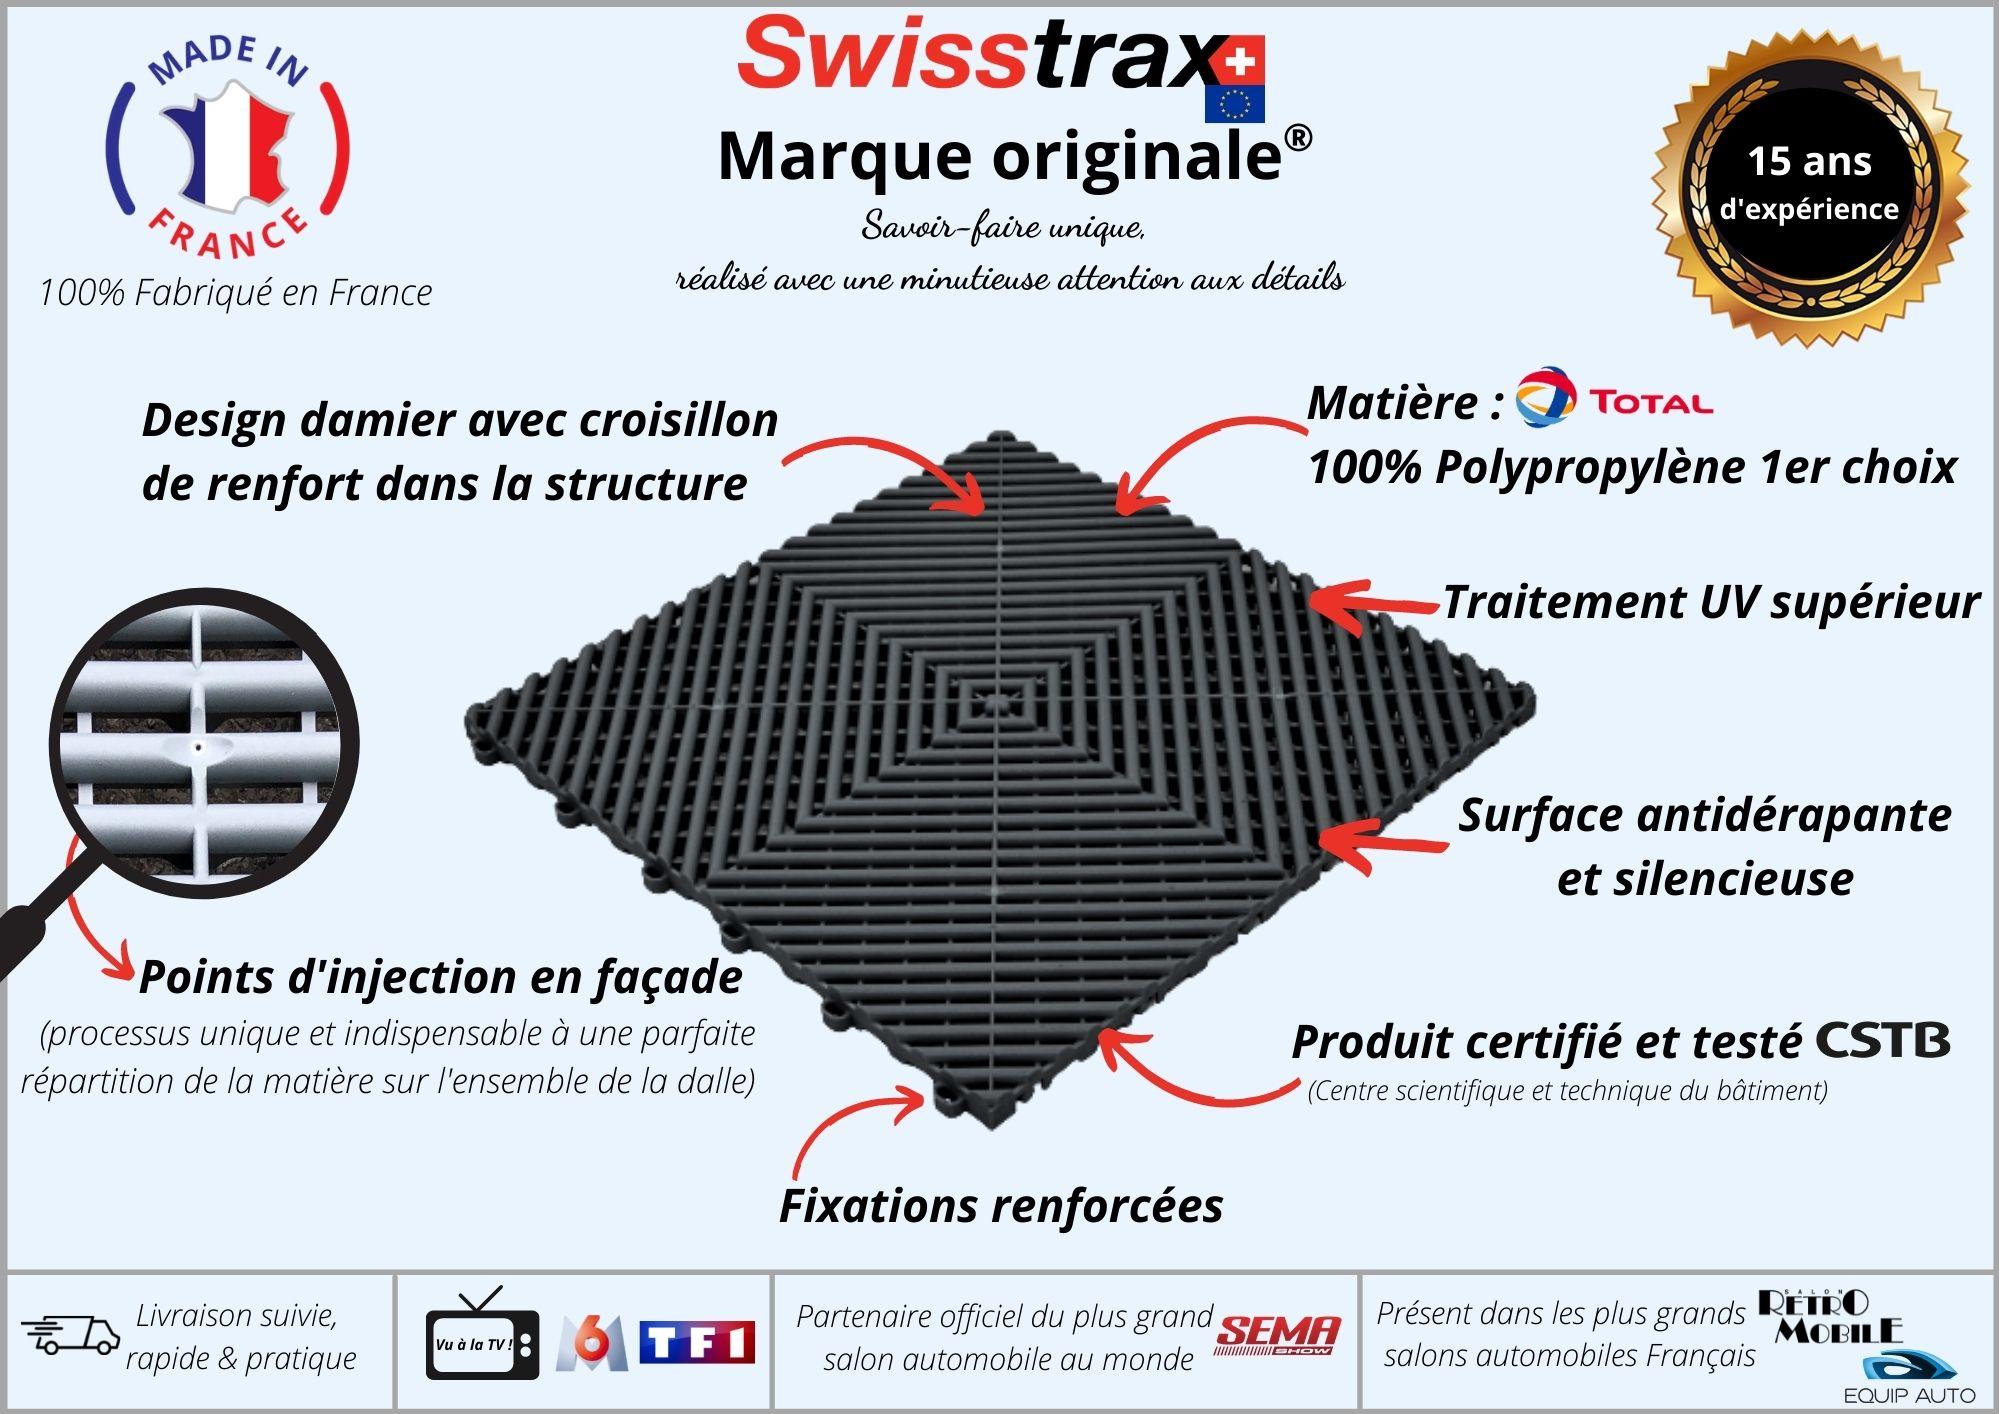 swisstrax marque originale